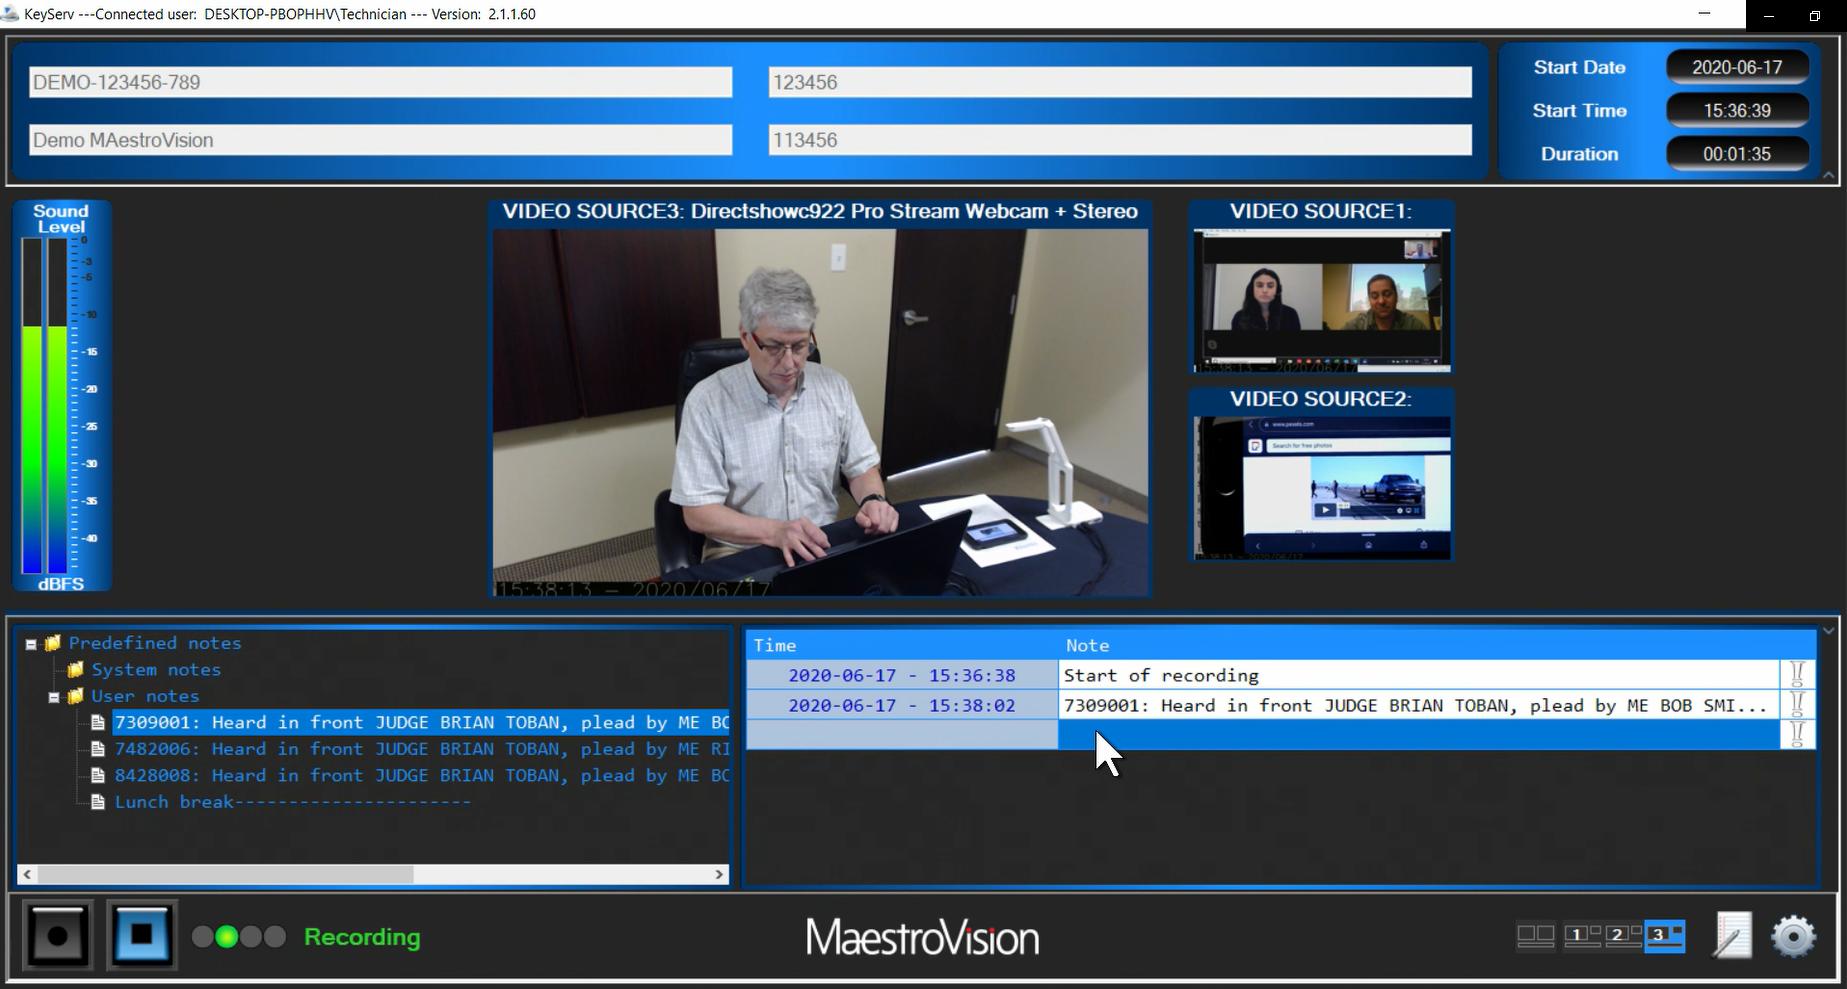 Courtroom recording MaestroVision Keyserv